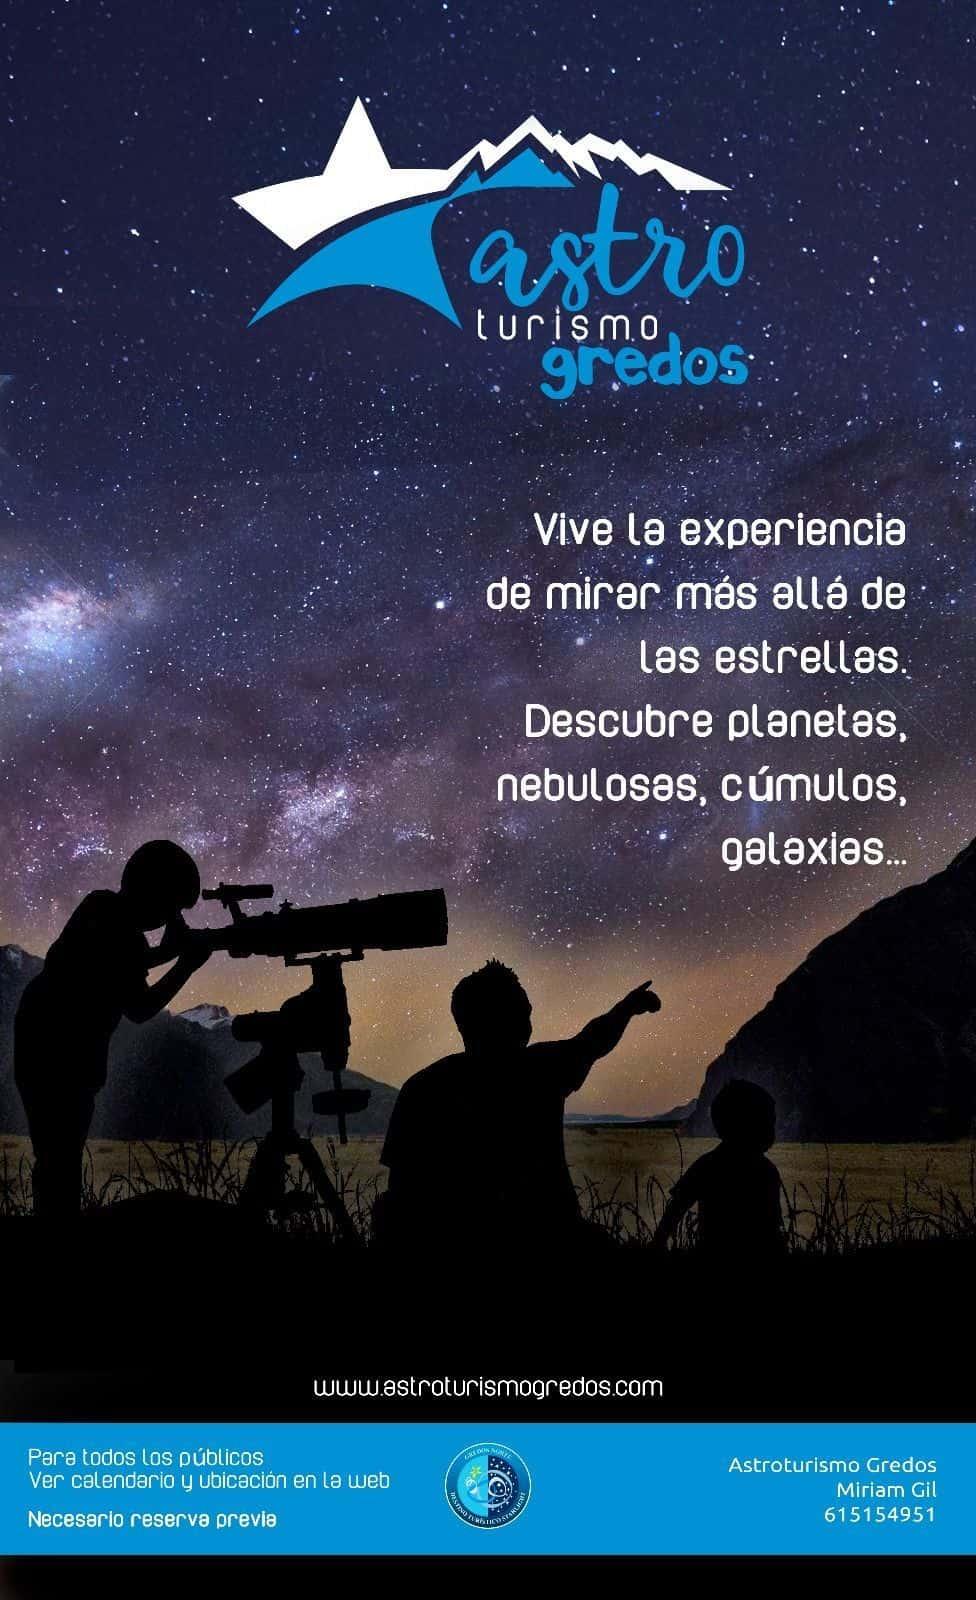 Astro Turismo Gredos